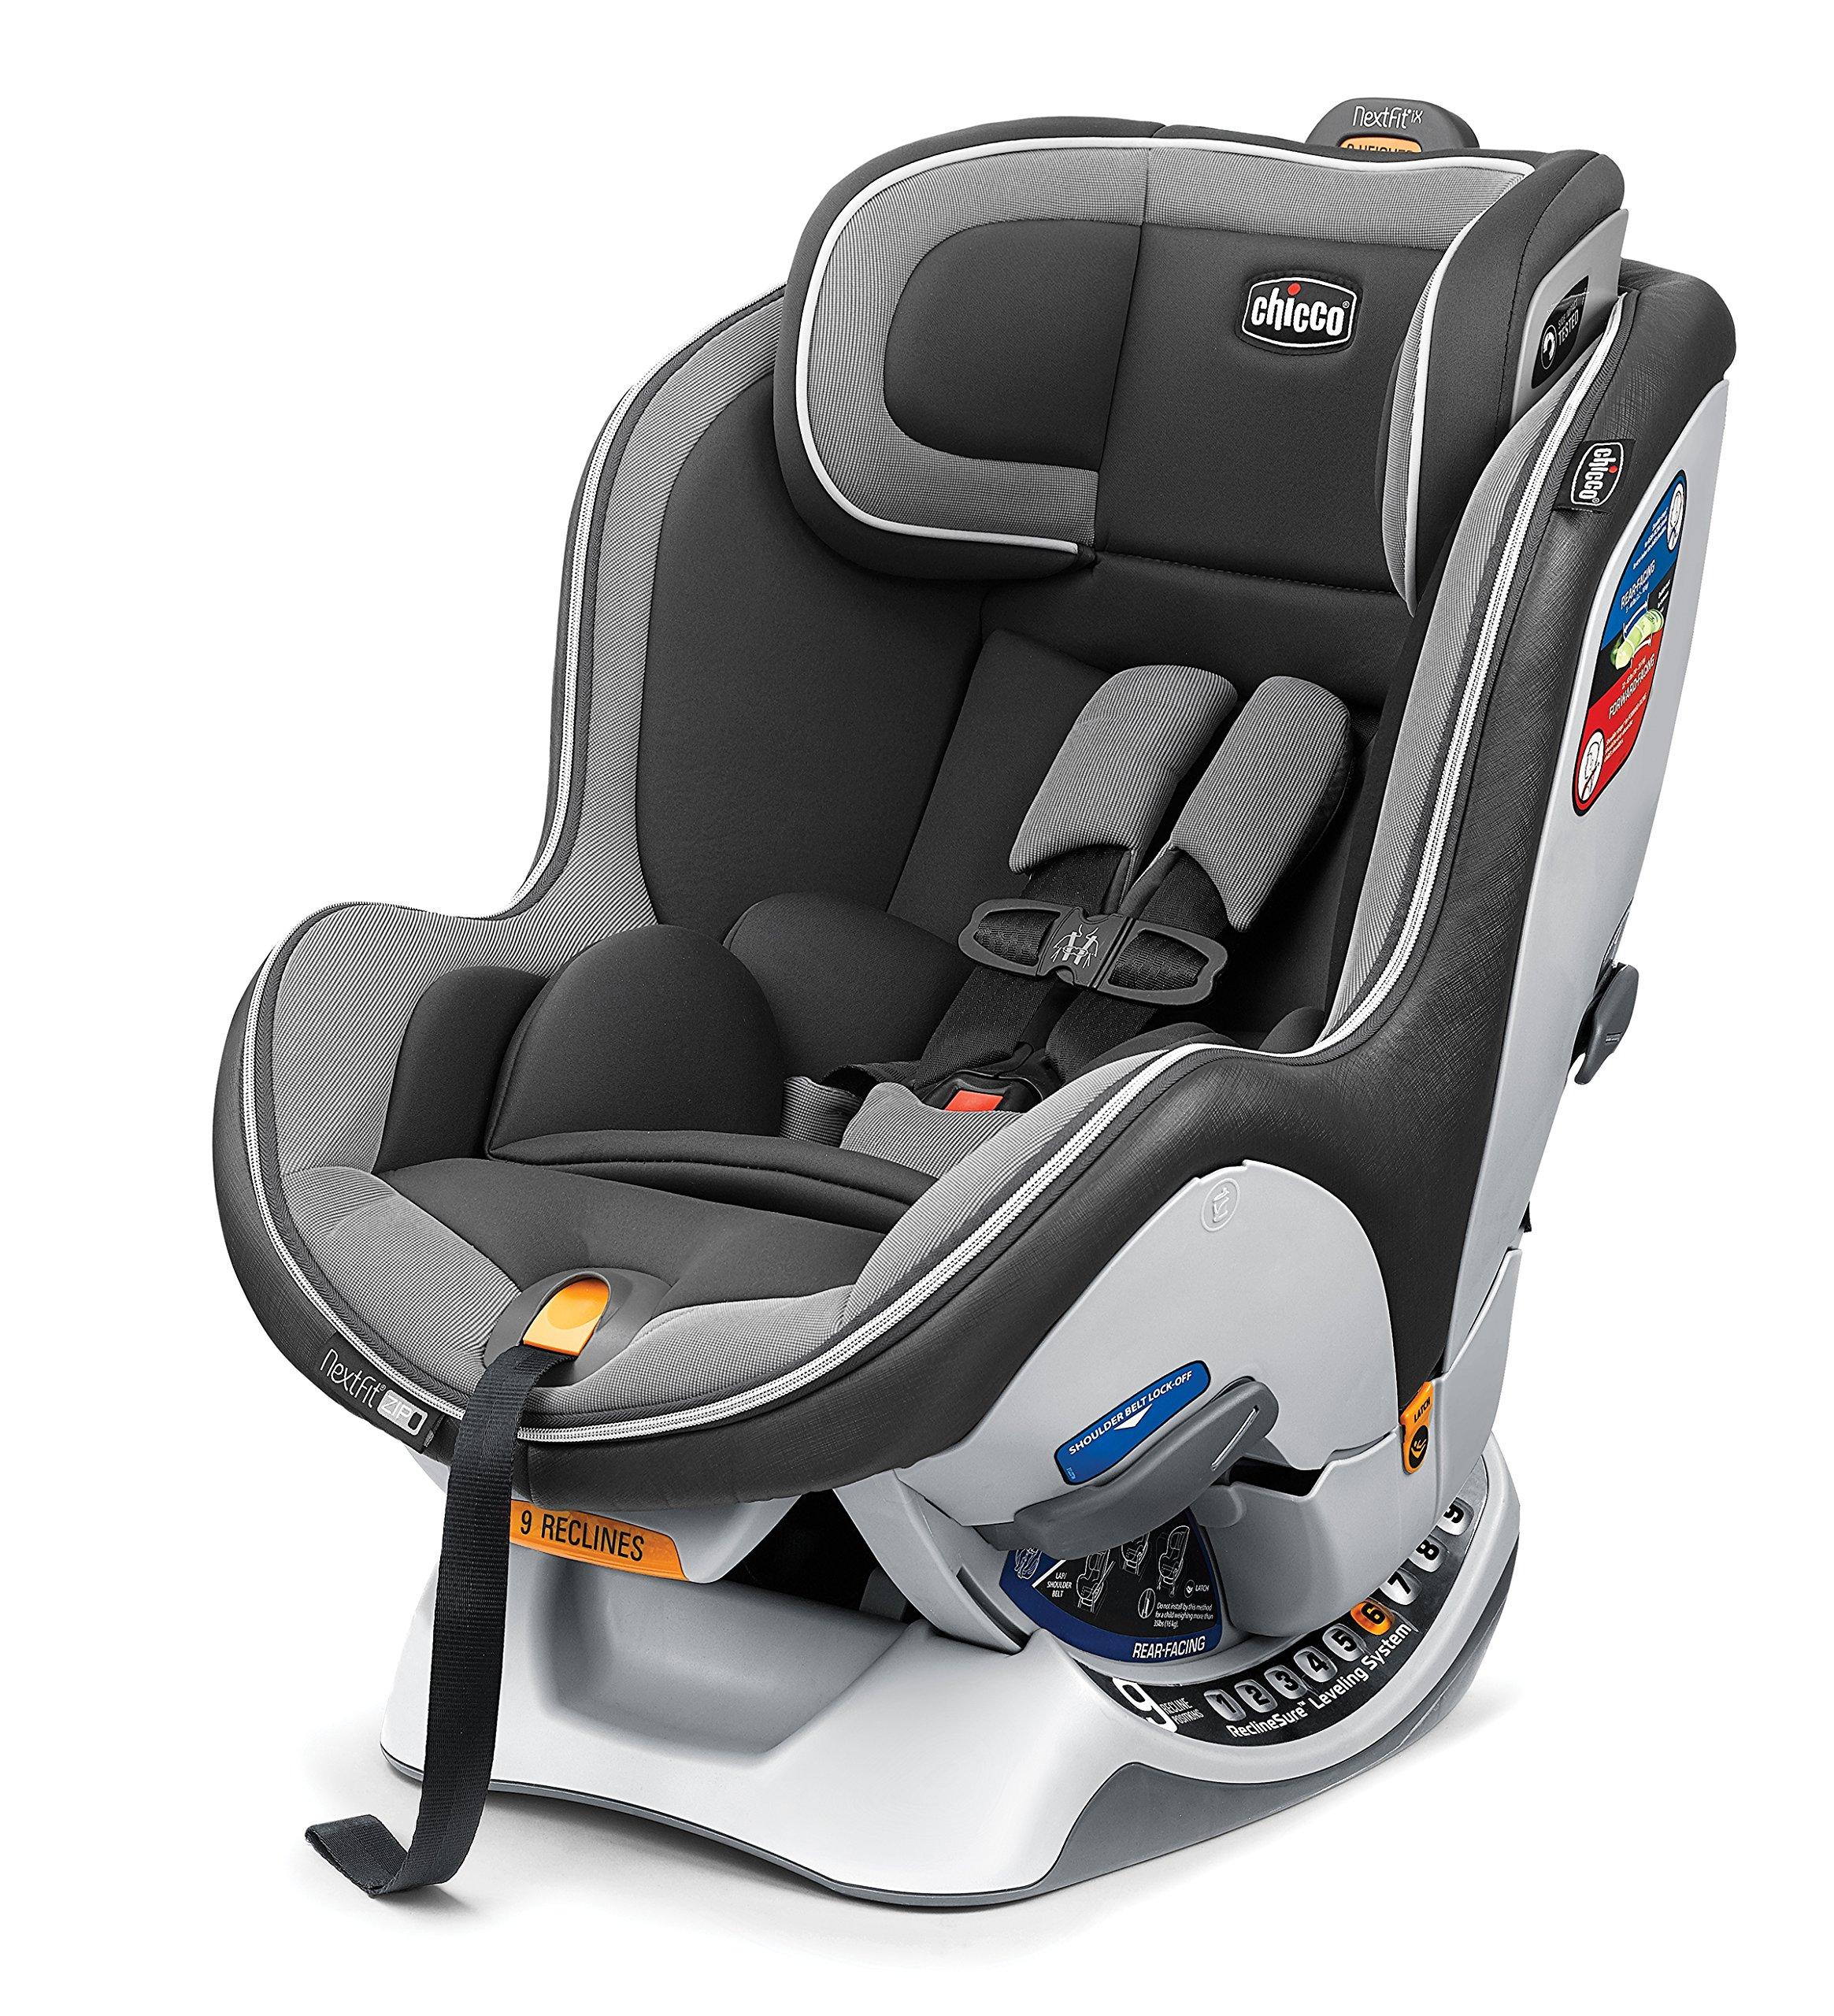 Amazon.com : Chicco Next Fit Zip, Lavender : Baby